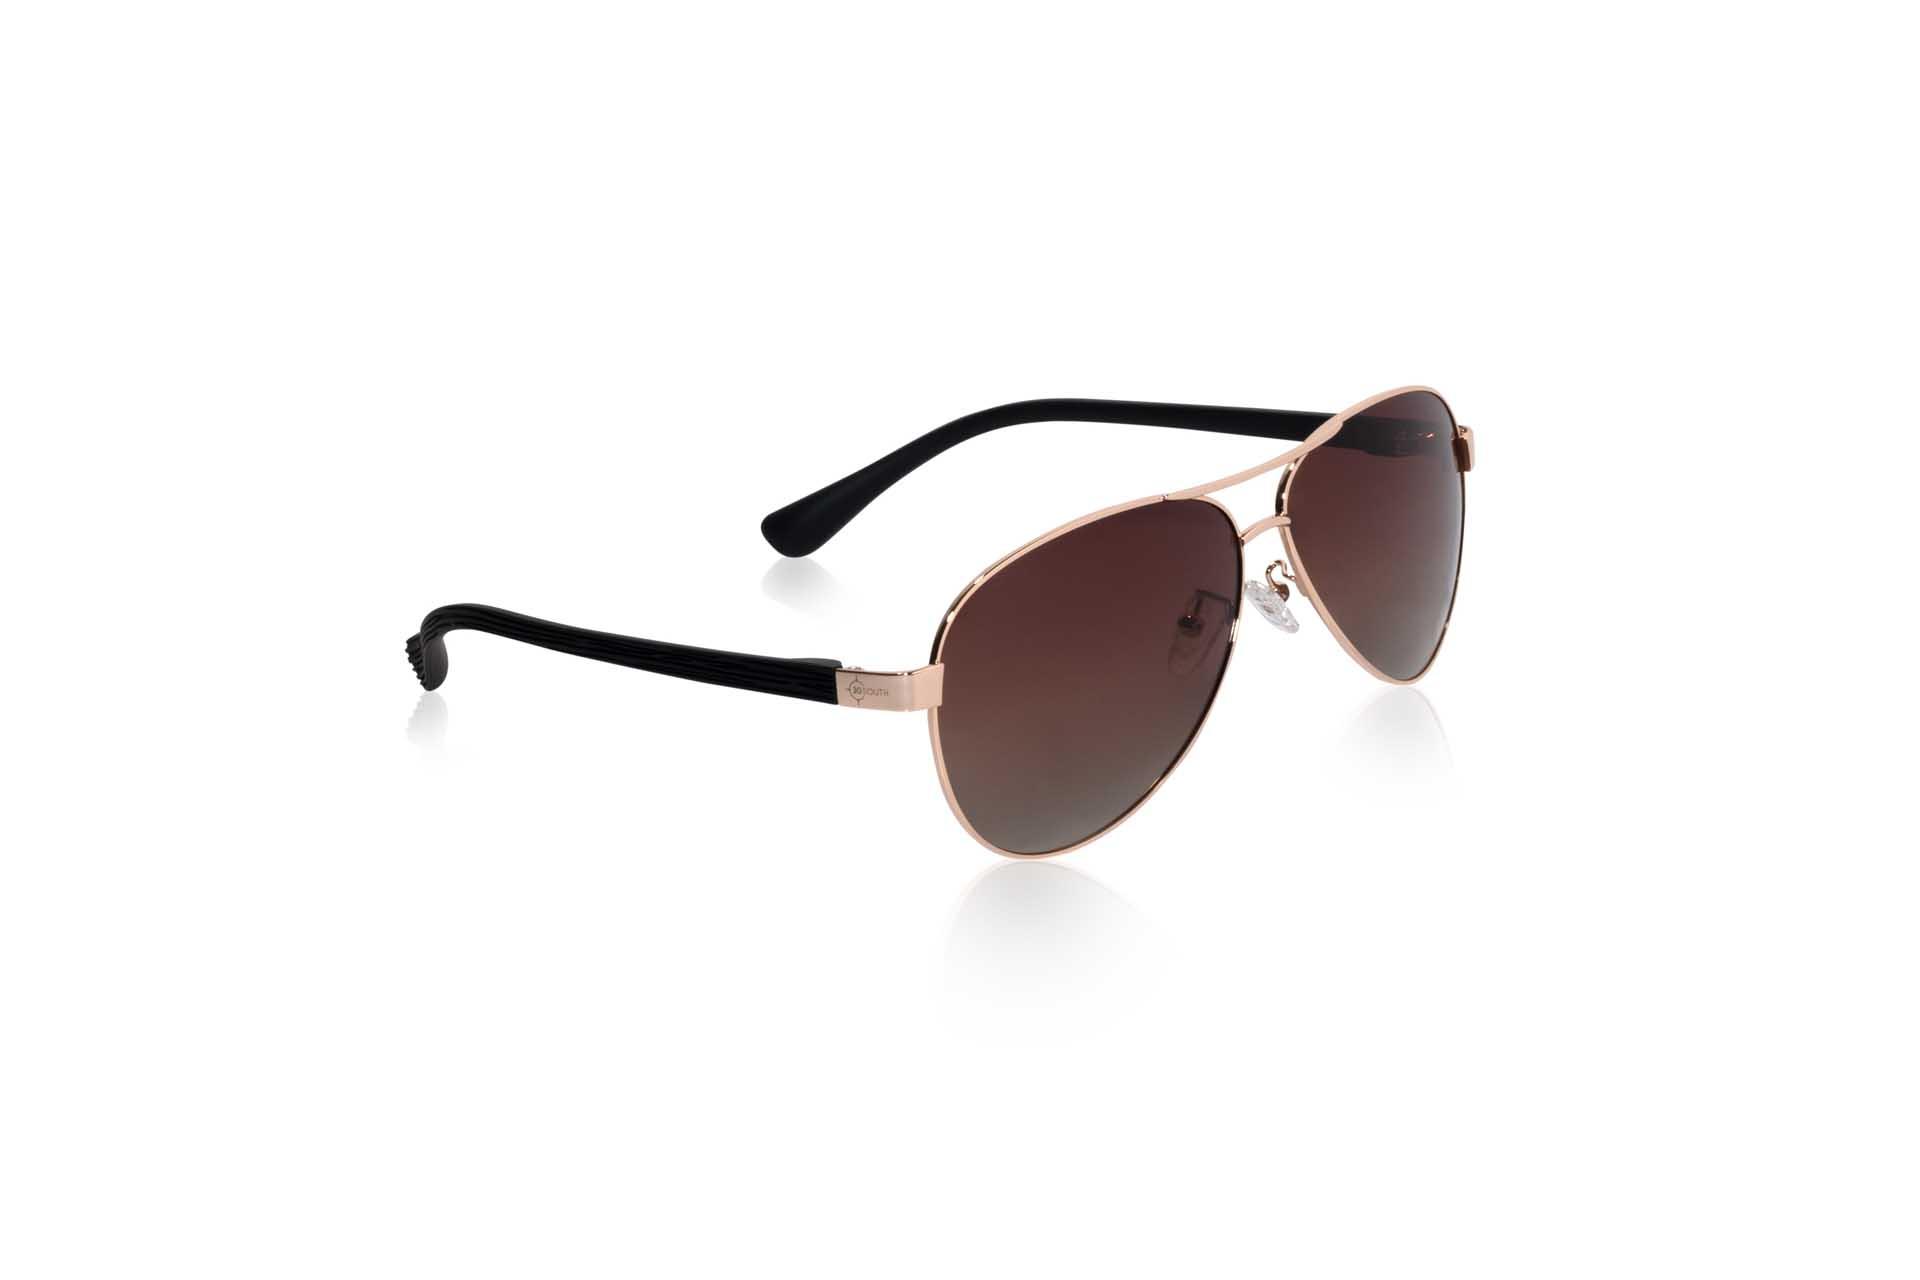 Photo of The Wingman Prospector sunglasses